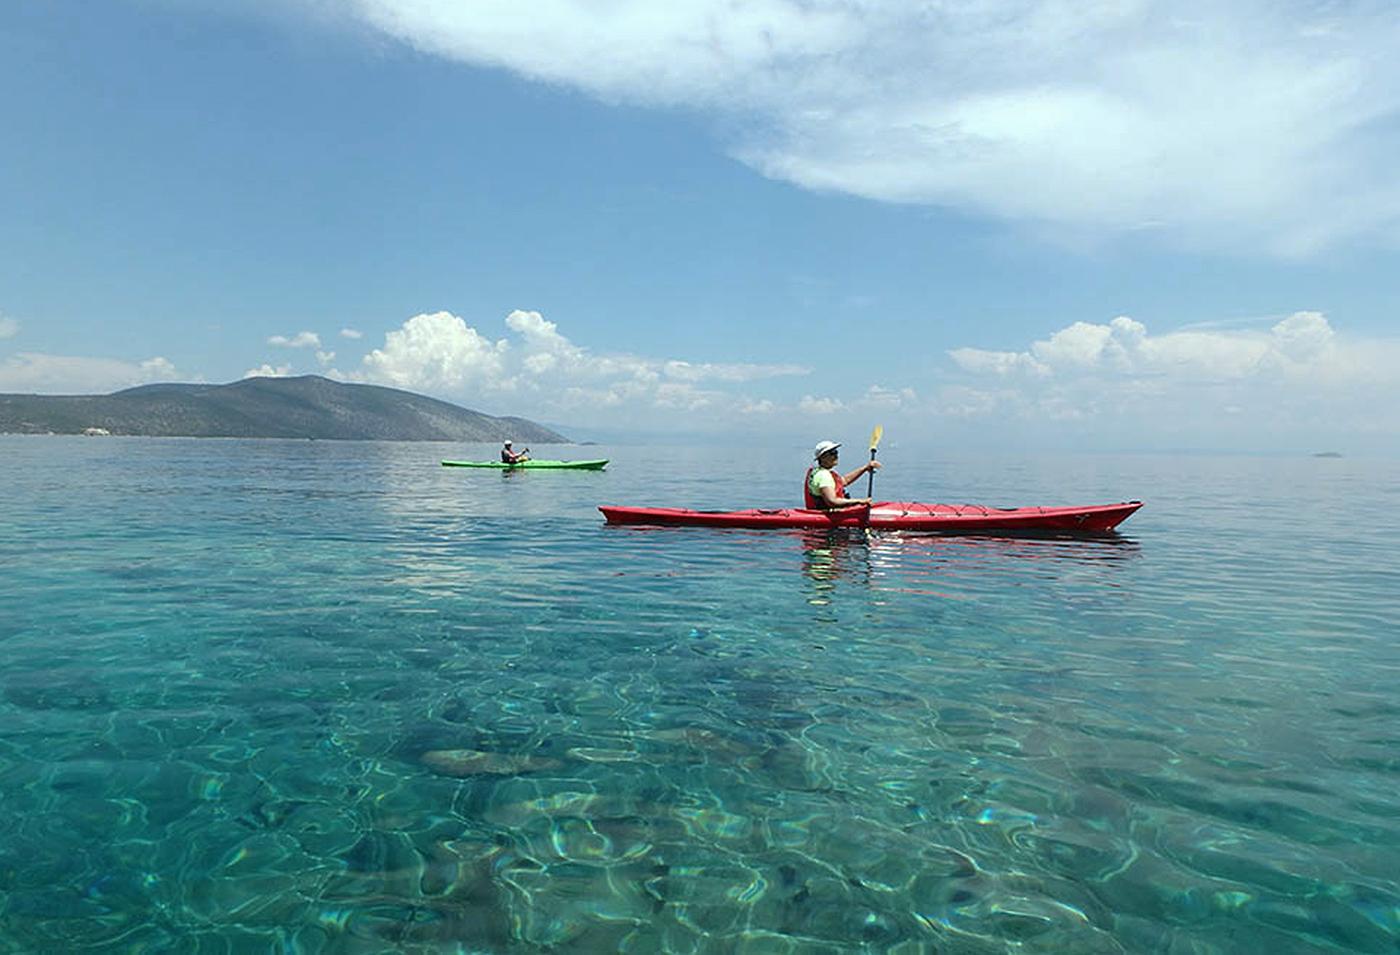 Sea Kayaking Expedition - Greece - Wild Human